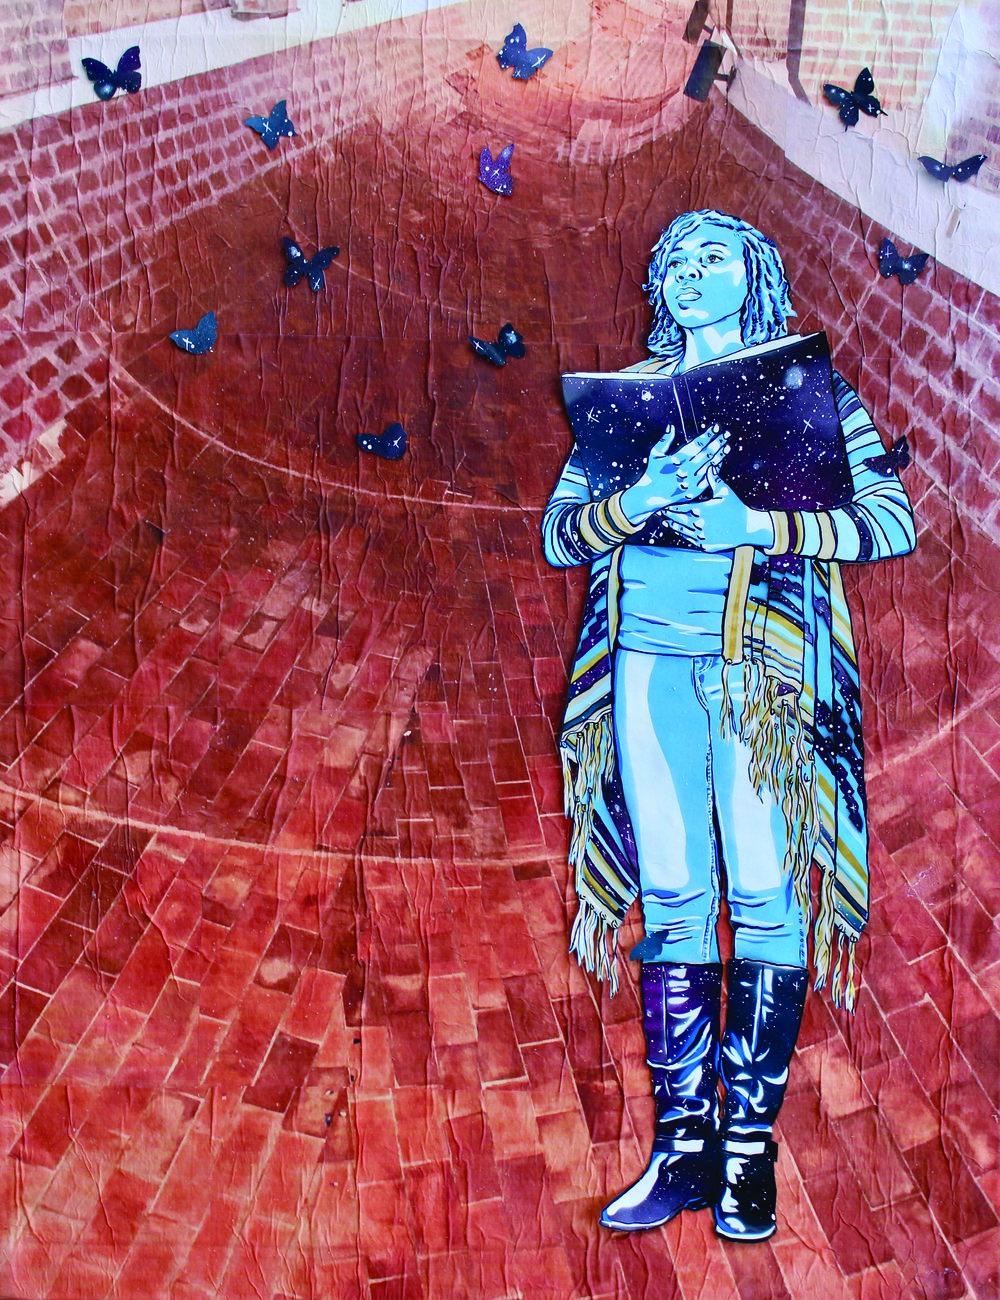 """Labyrinth of Imagination""', hand-cut stencil, spray paint, acrylic, photo (Cuba, National Art Schools), paper on canvas, 2019, 36"" x 30"""